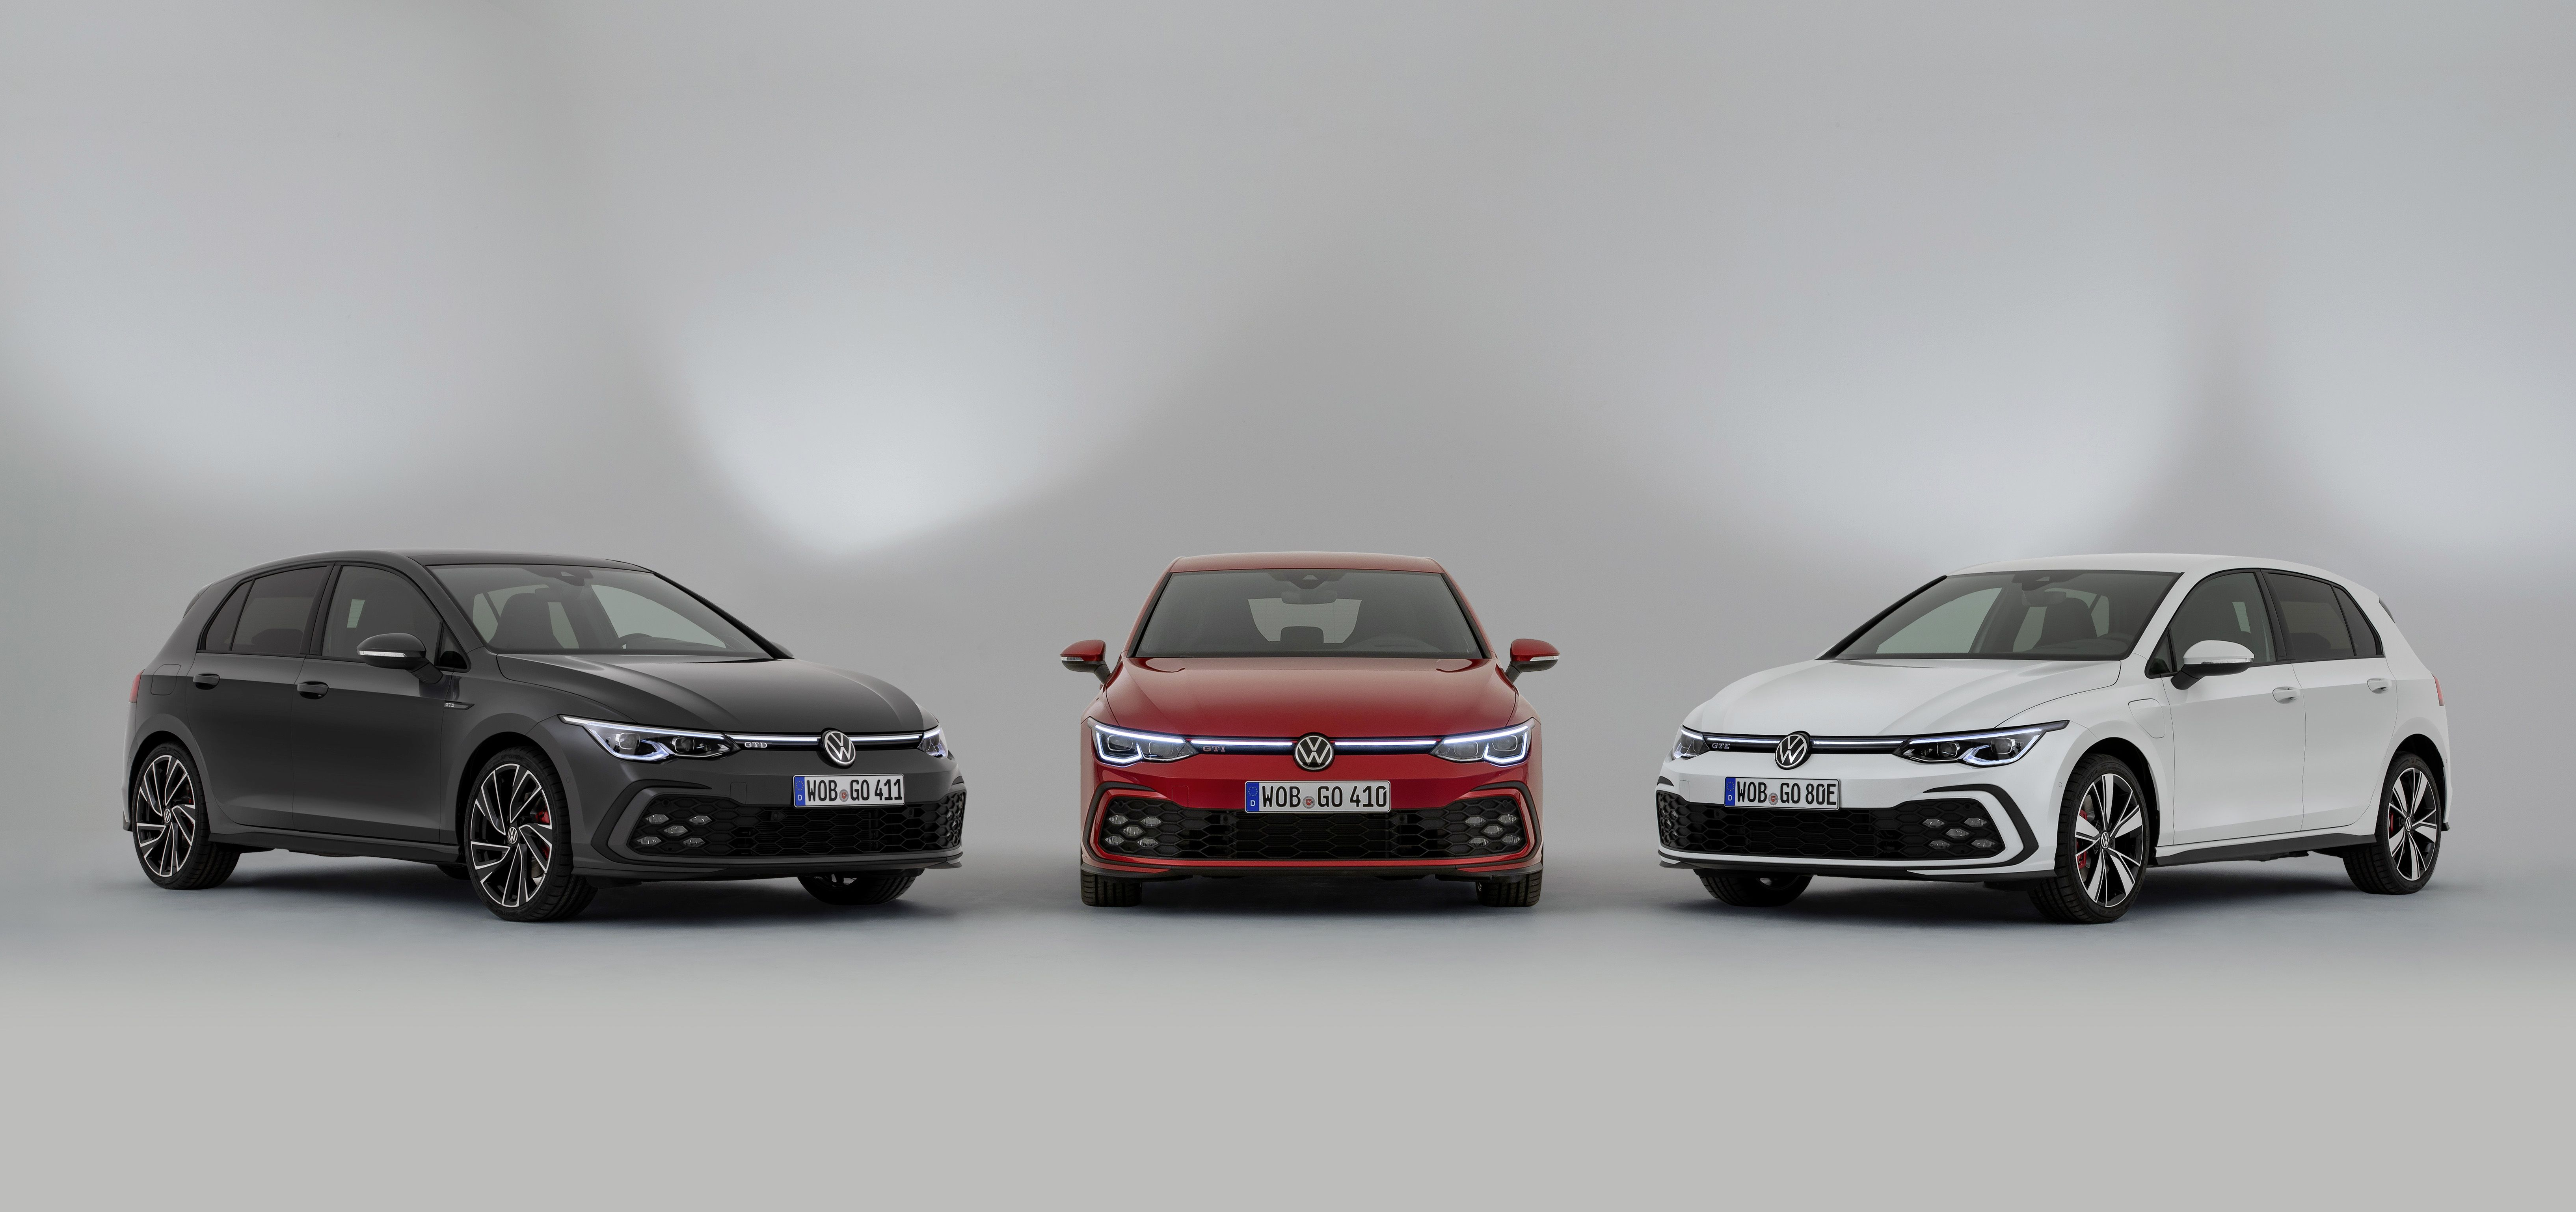 Volkswagen Golf 8 Gti Gte Gtd Factory Issued Press Photo 02 2020 Volkswagen Volkswagen Golf Novo Golf